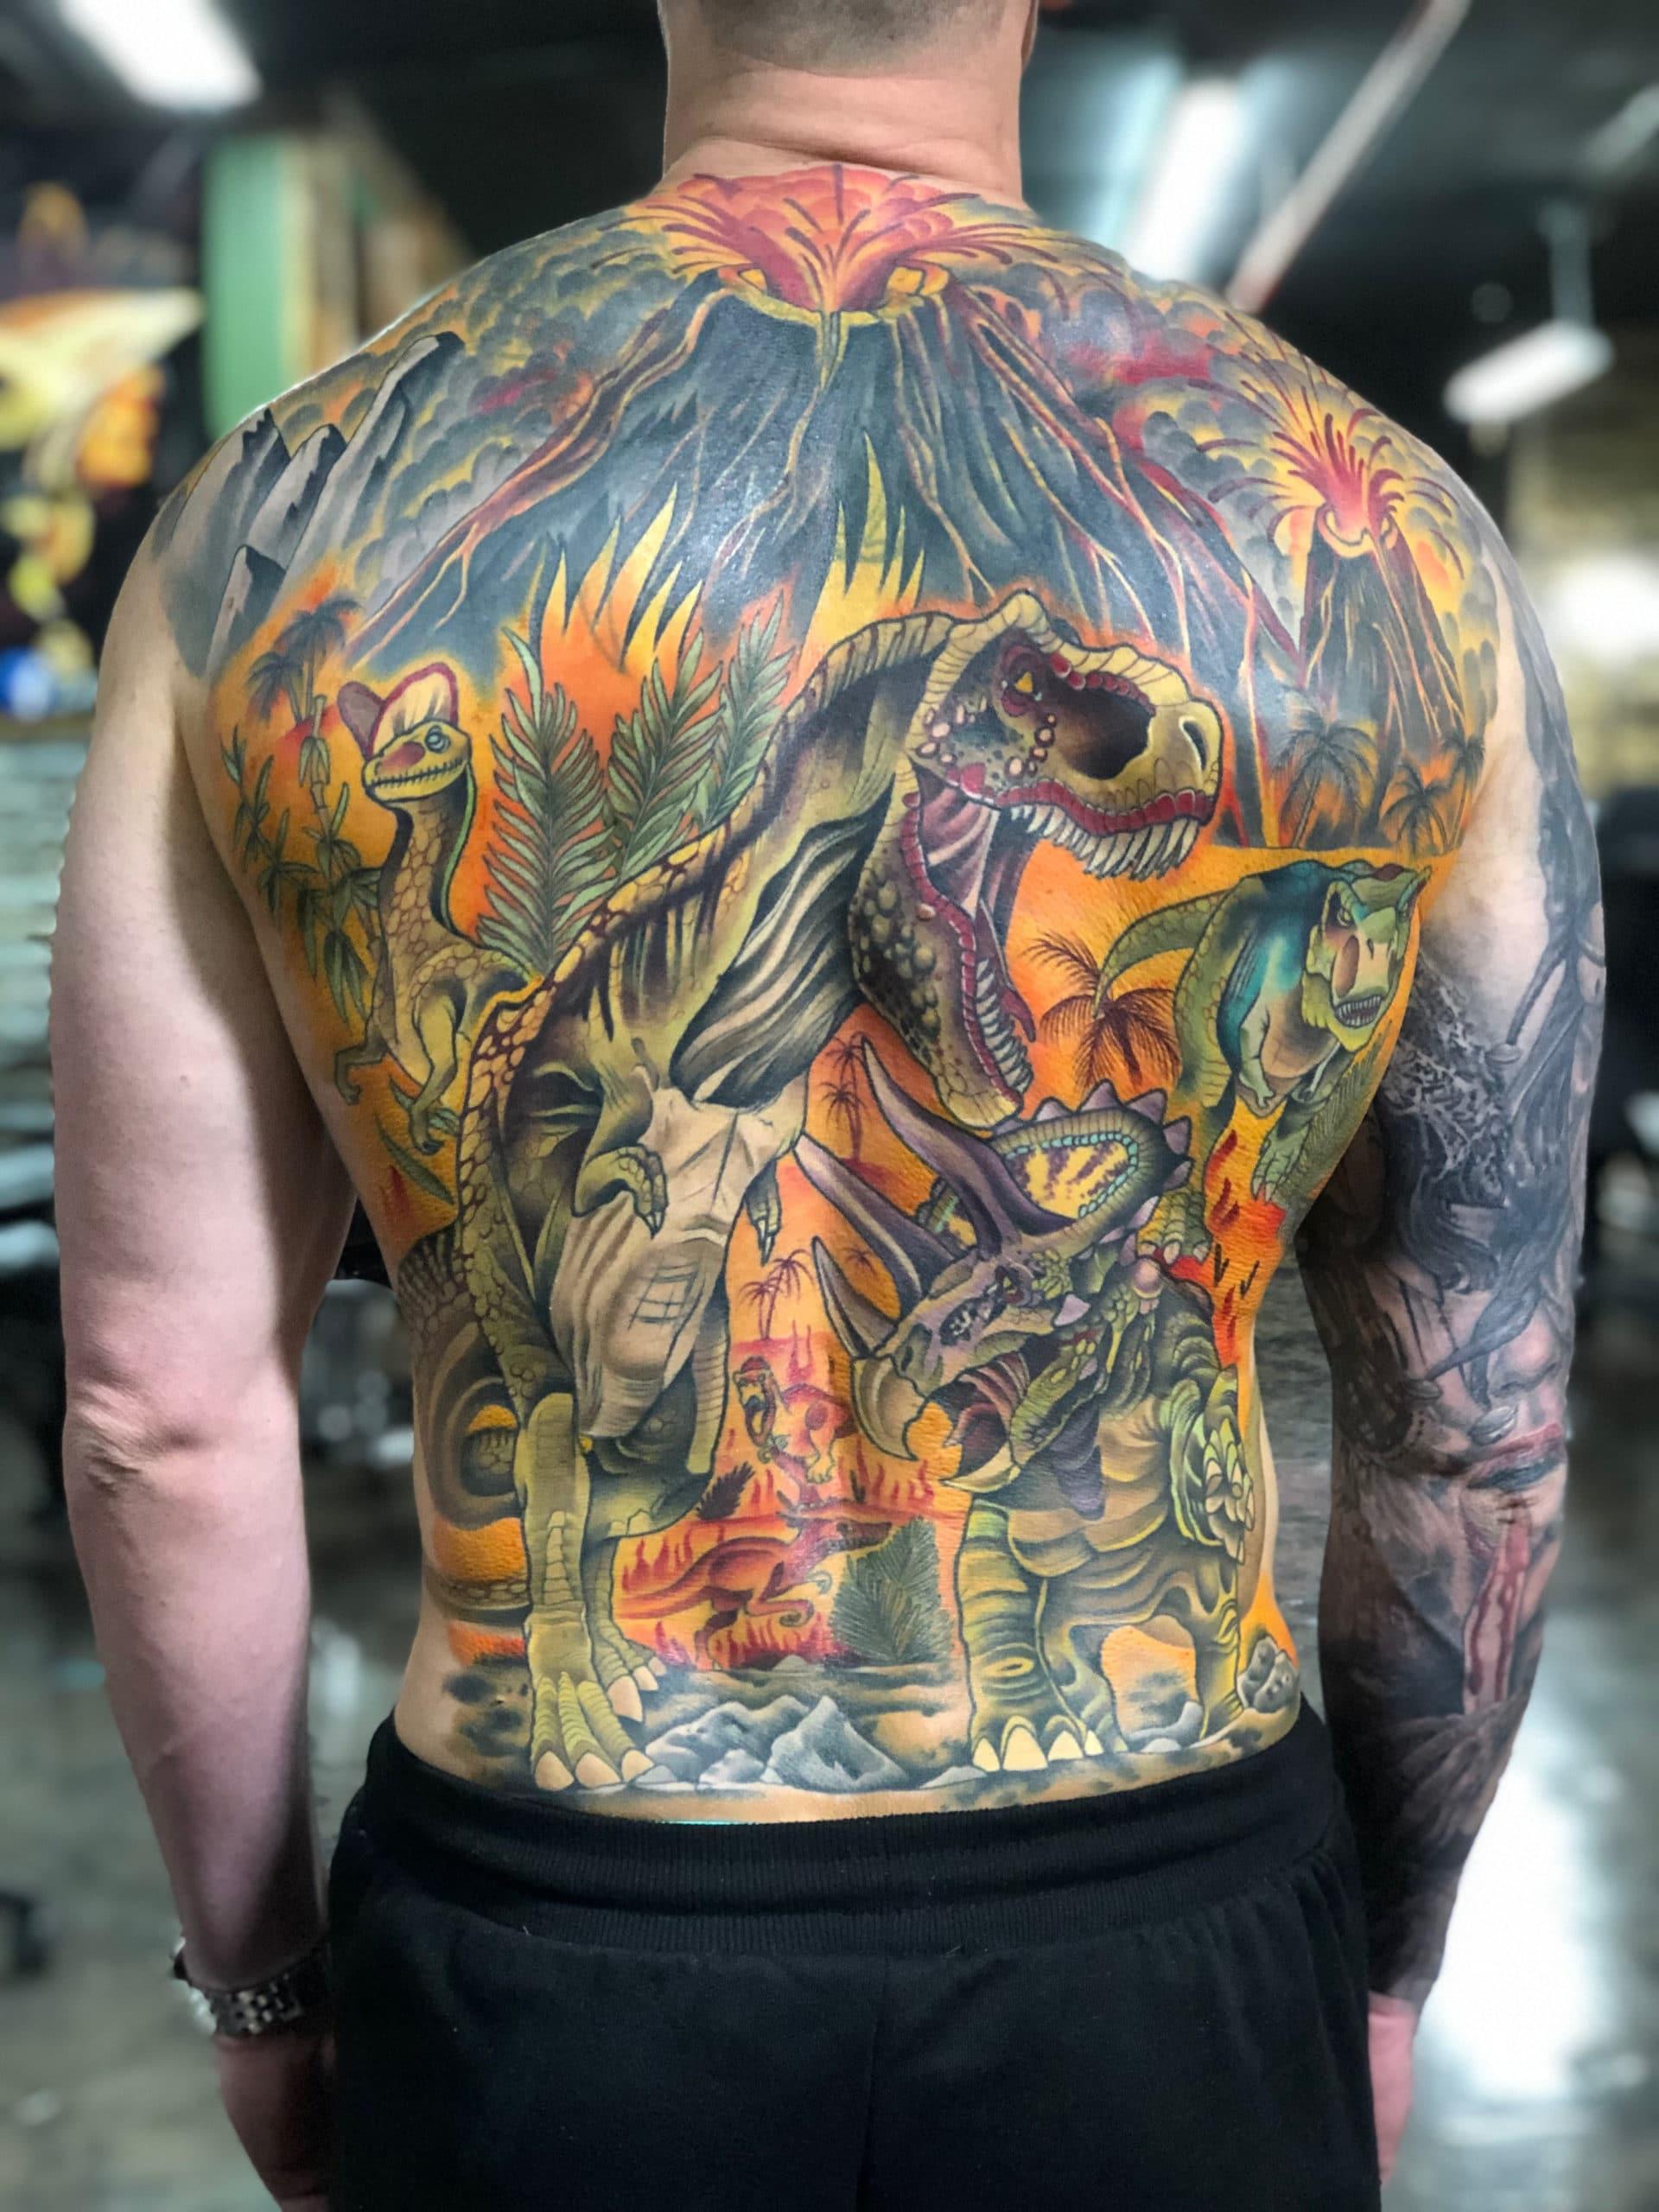 Tyler Nolan Tattoo : tyler, nolan, tattoo, Tyler, Nolan, Appointment, Deposit, Sunshine, State, Tattoo